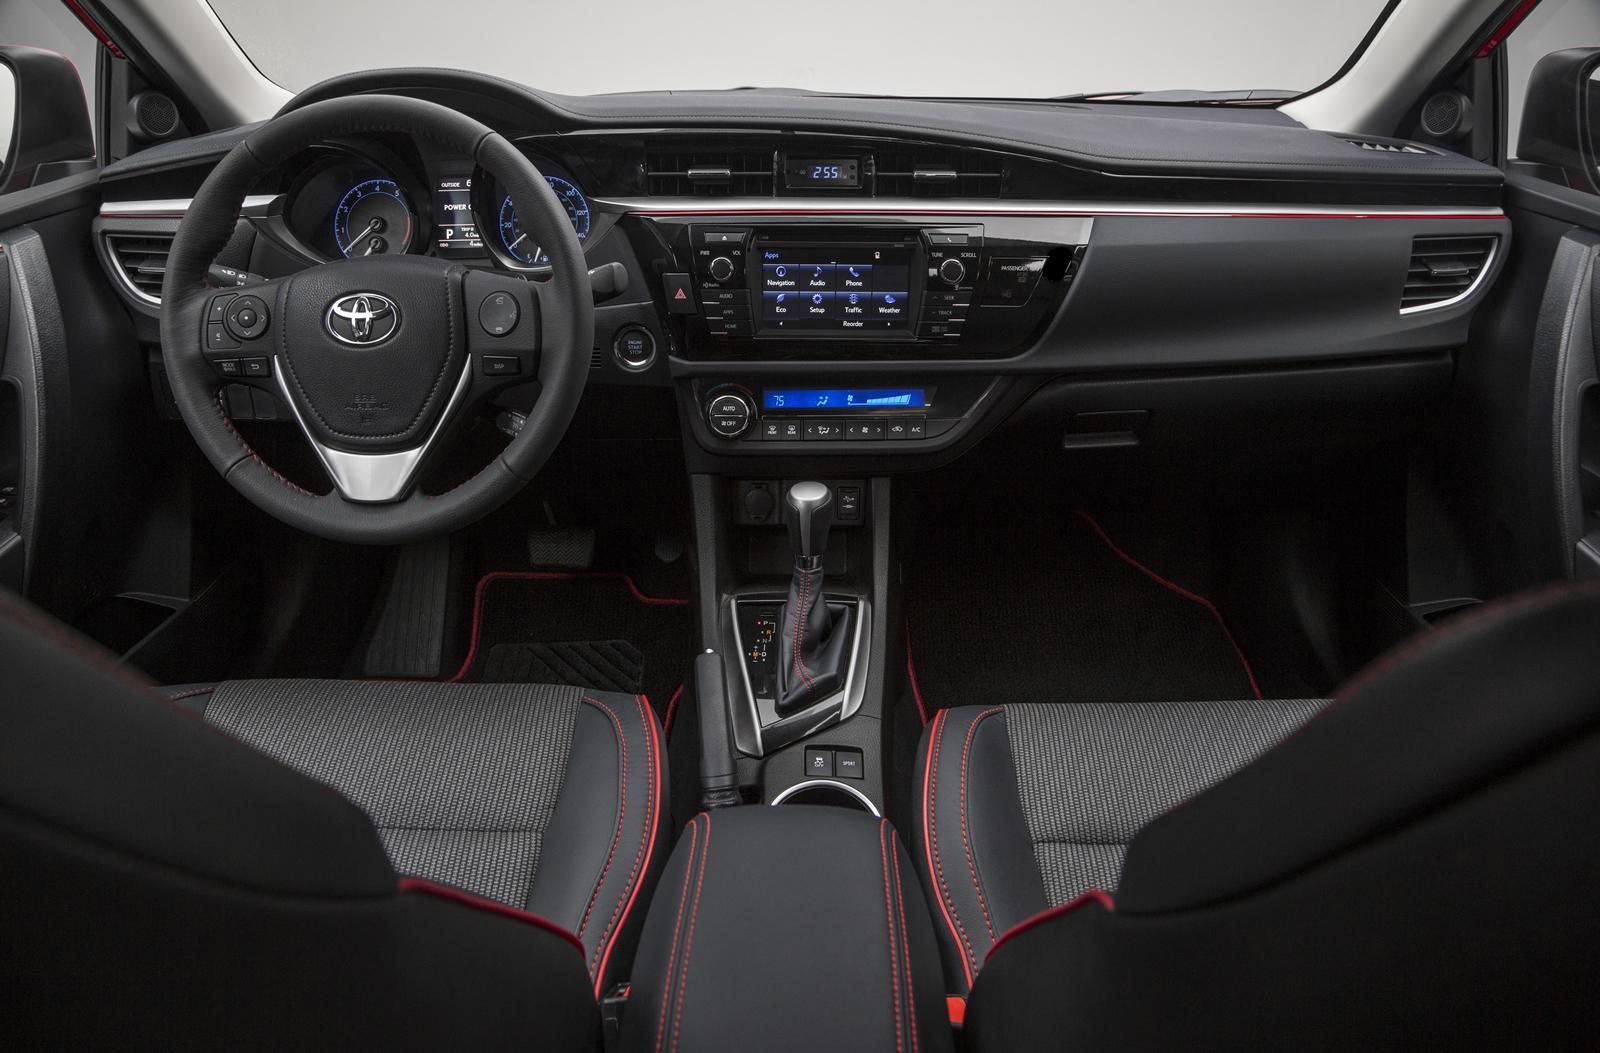 2014-2015 Corolla Seats - Scion iM Forum